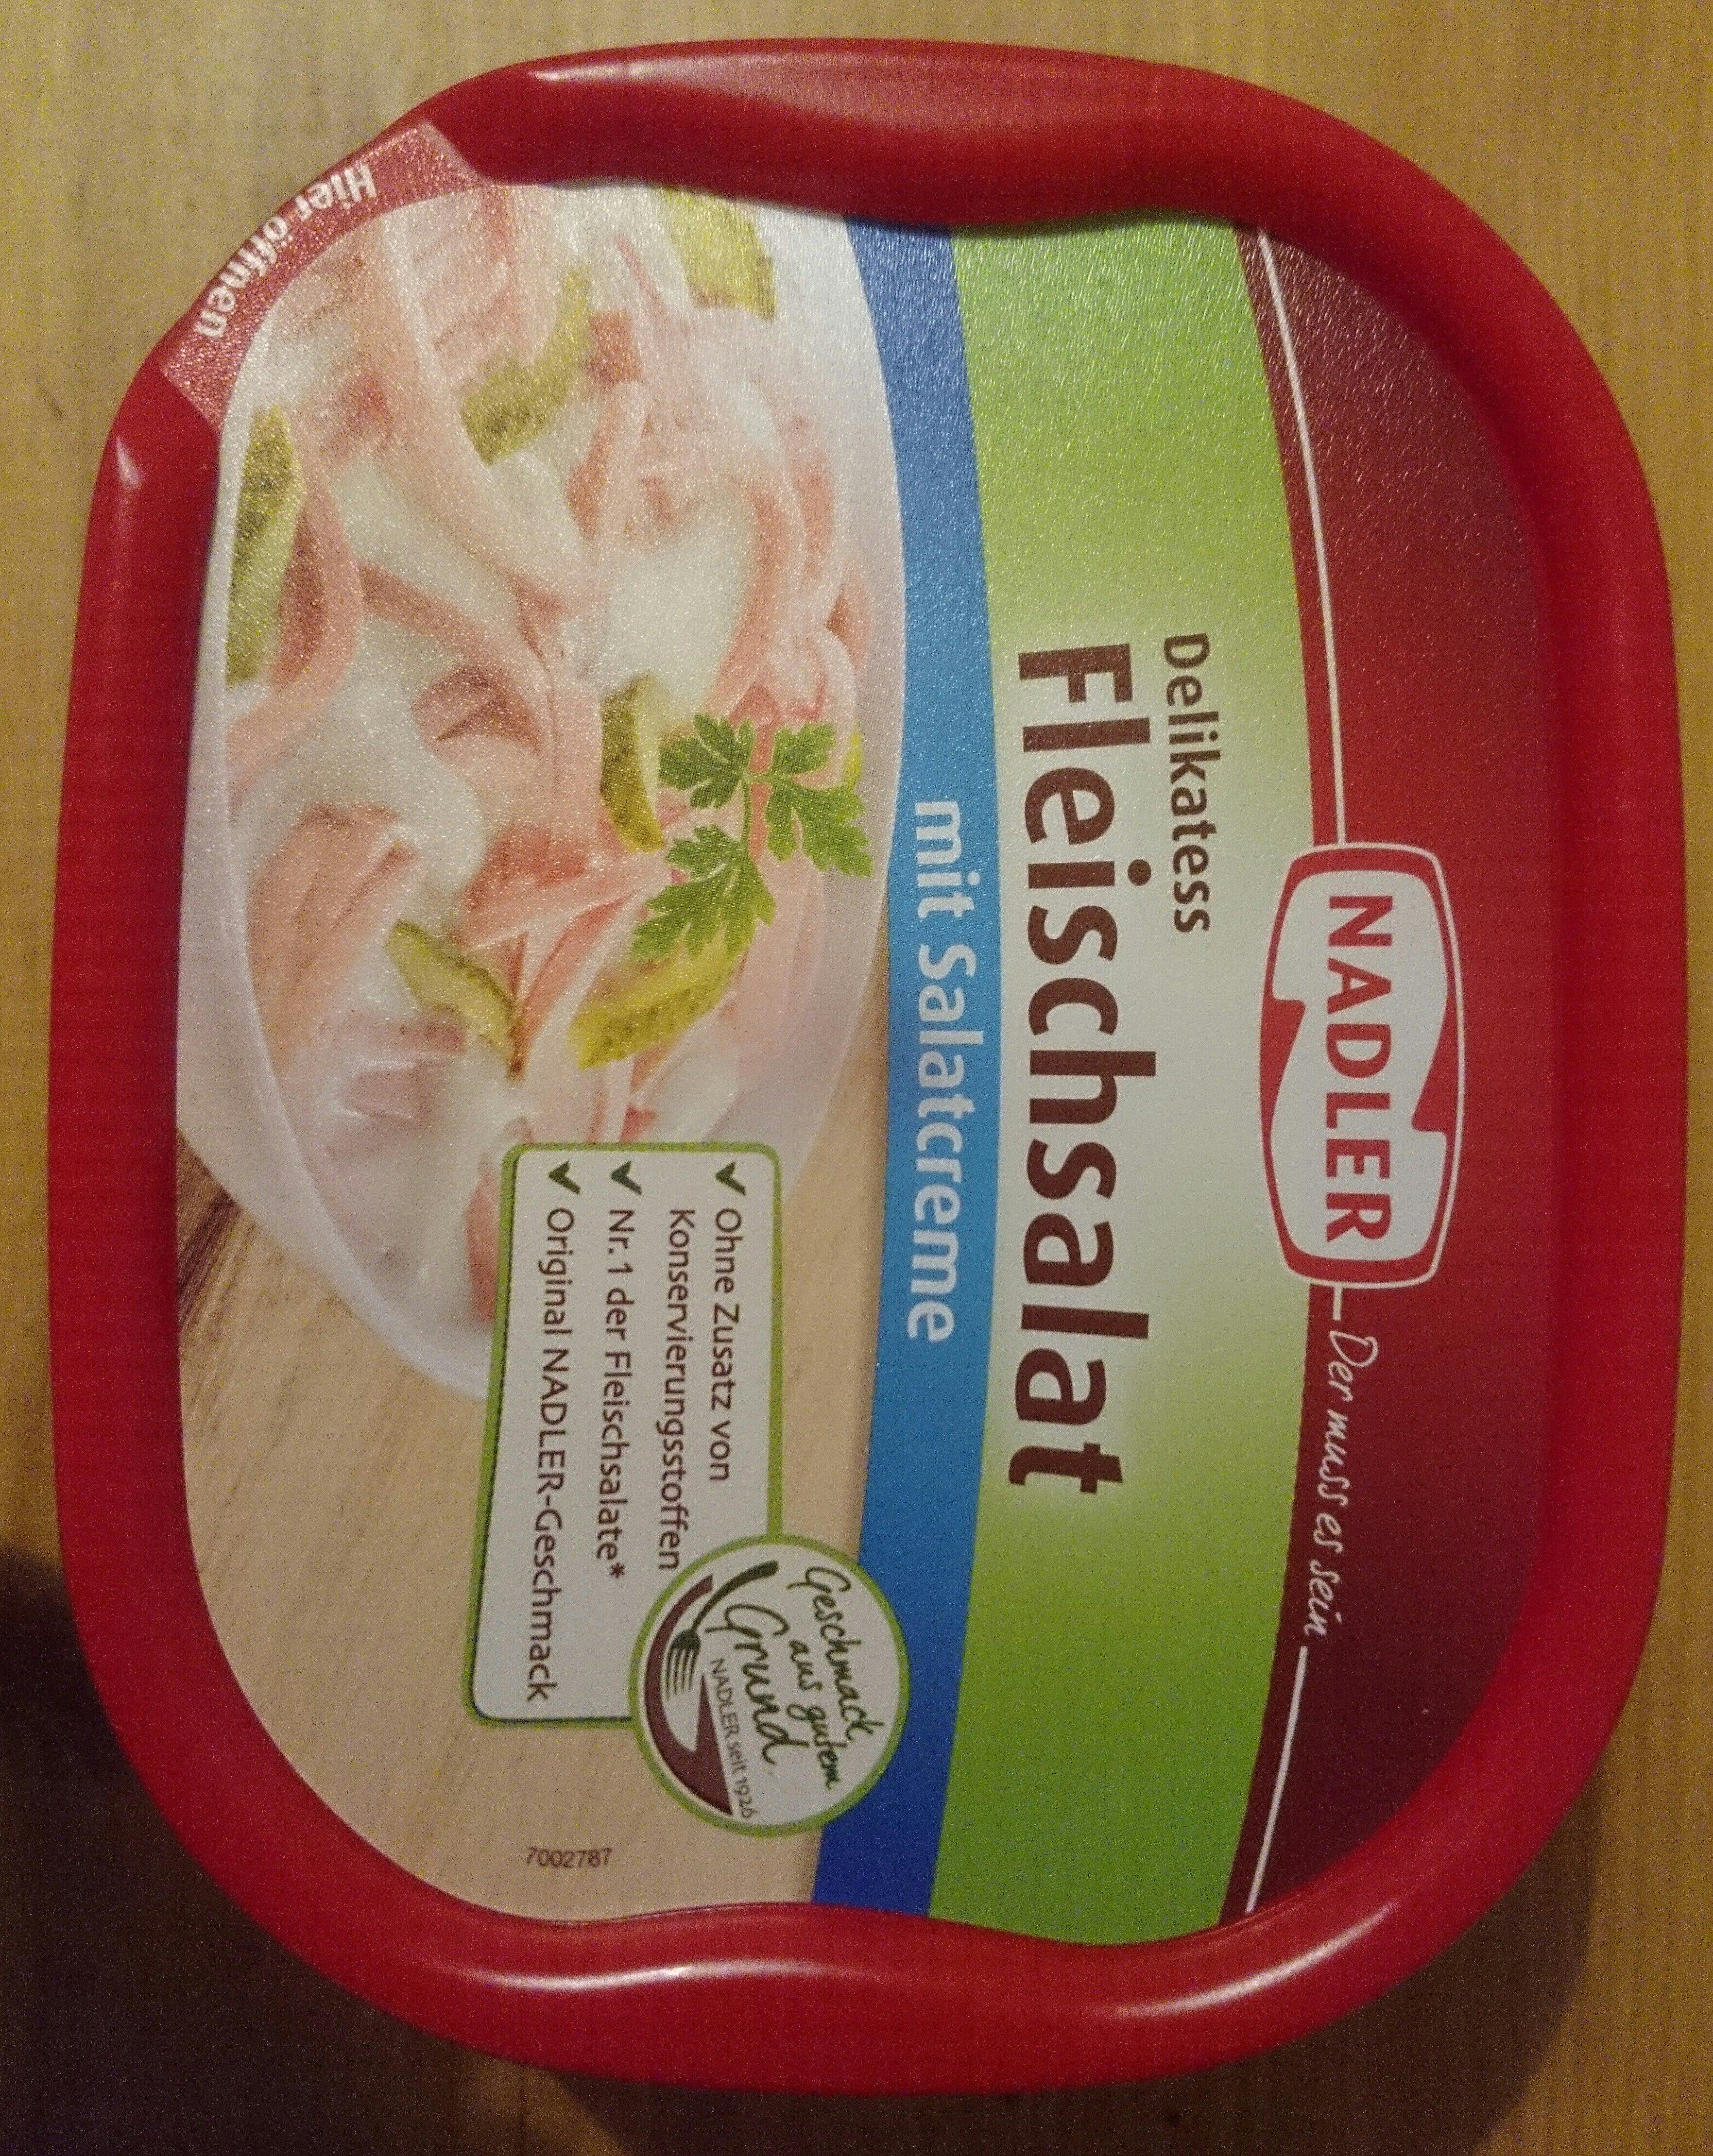 Delikatess Fleischsalat mit Salatcreme - Produit - de